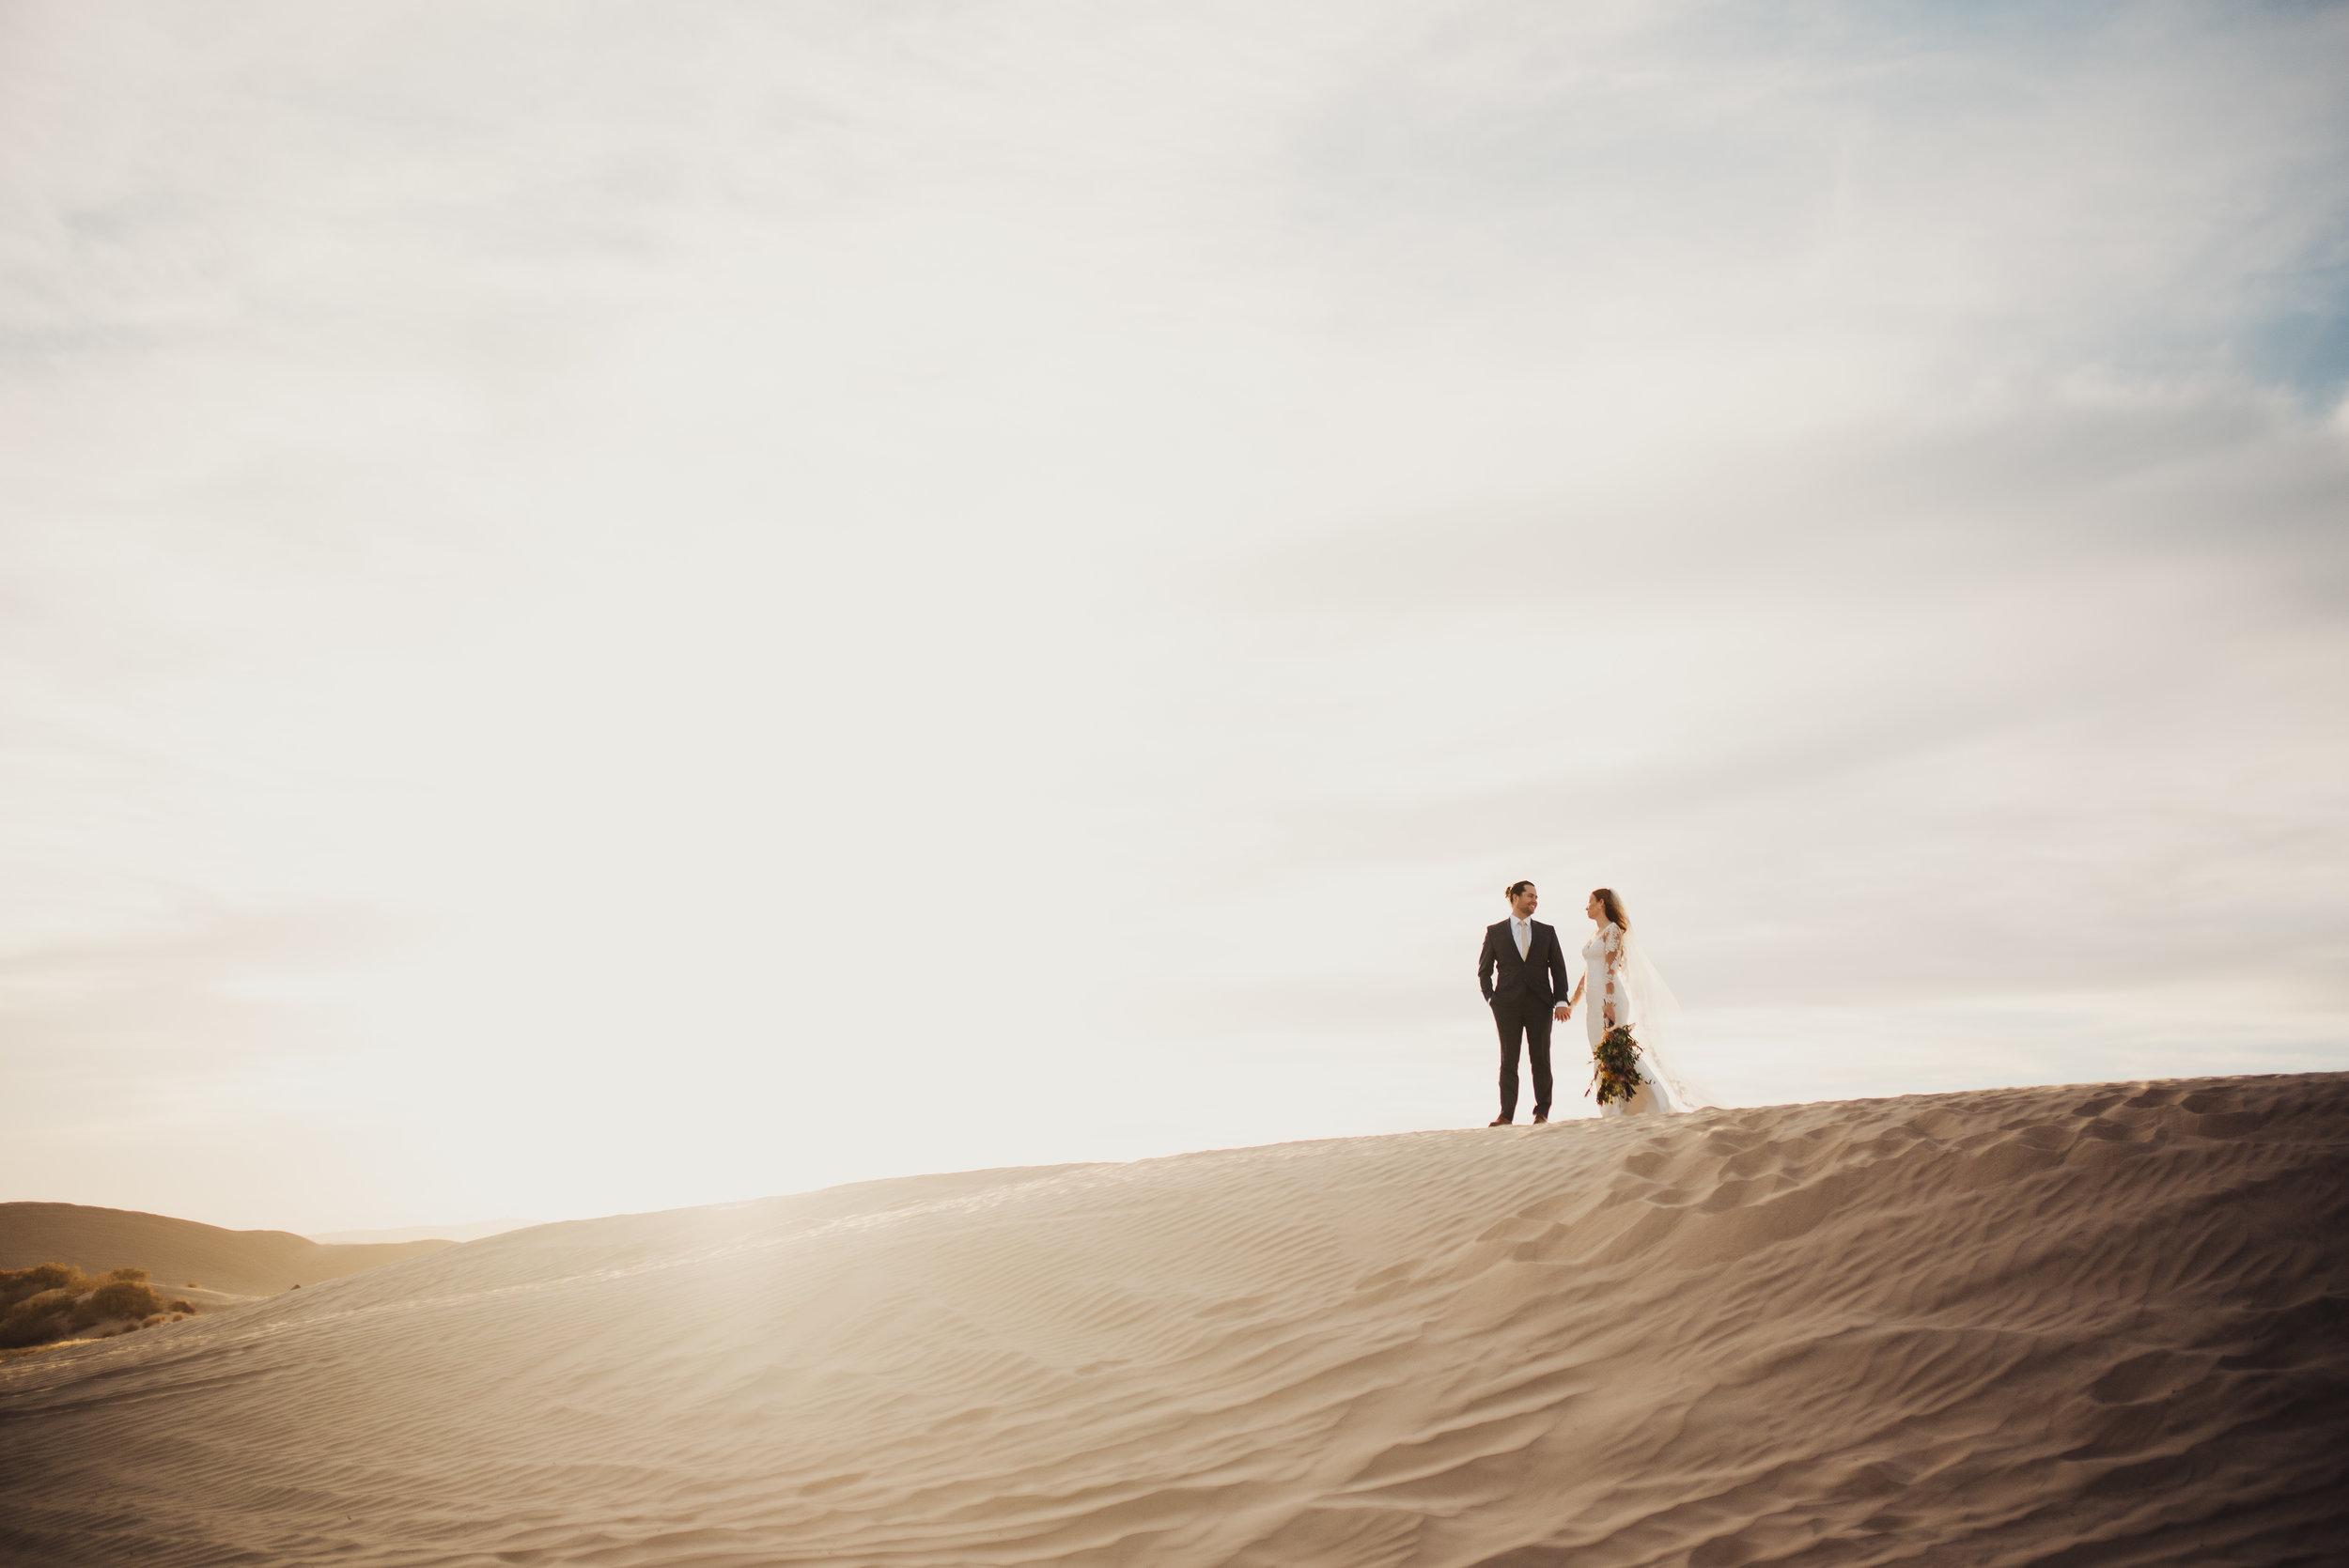 k-and-d-bridals-edenstraderphoto-18.jpg